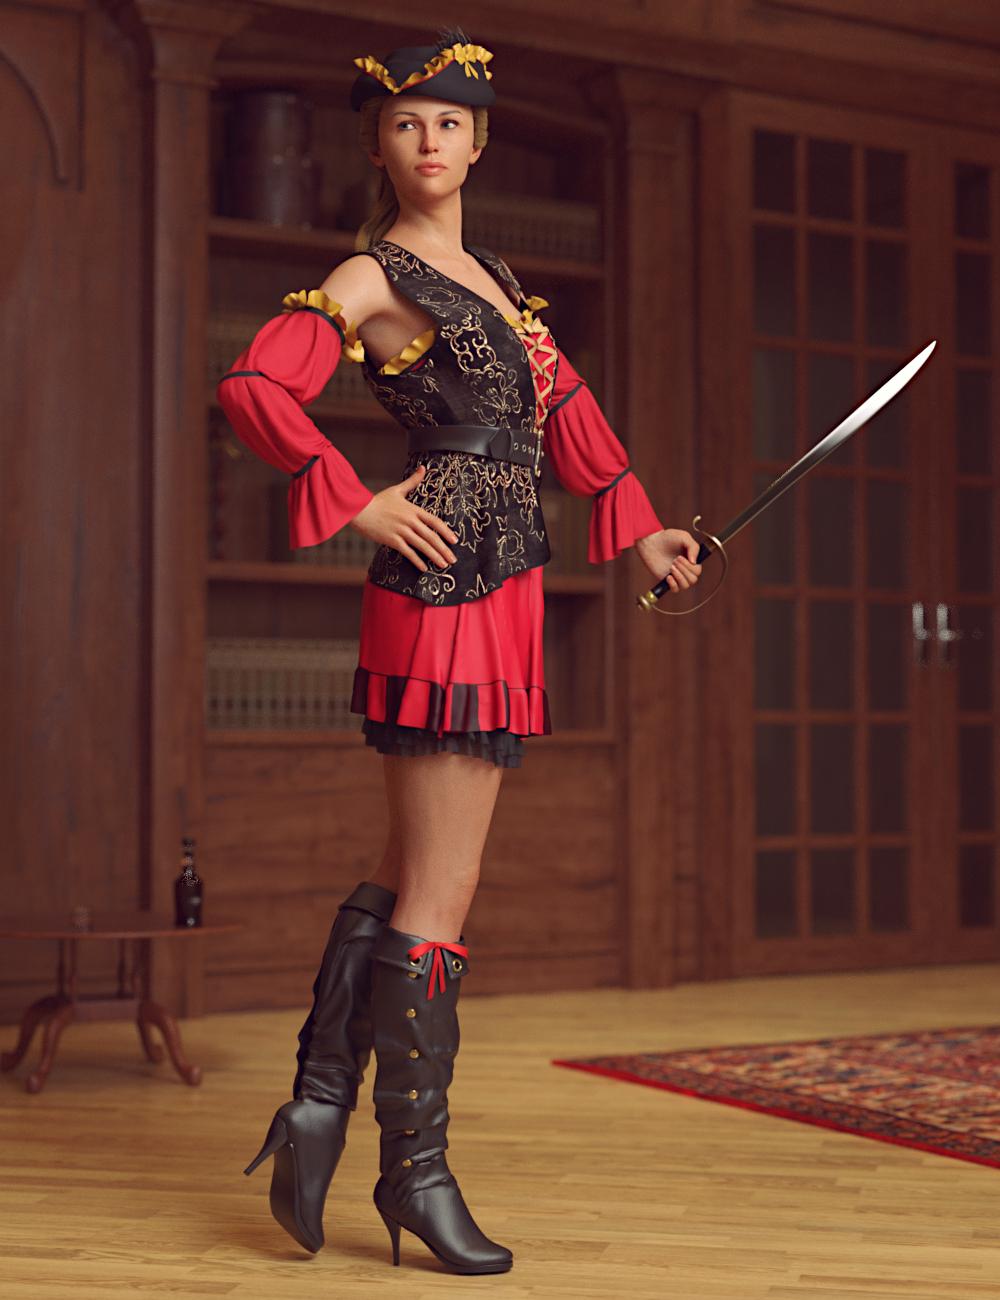 dForce Corsair Wench for Genesis 8 Female(s) by: Toyen, 3D Models by Daz 3D